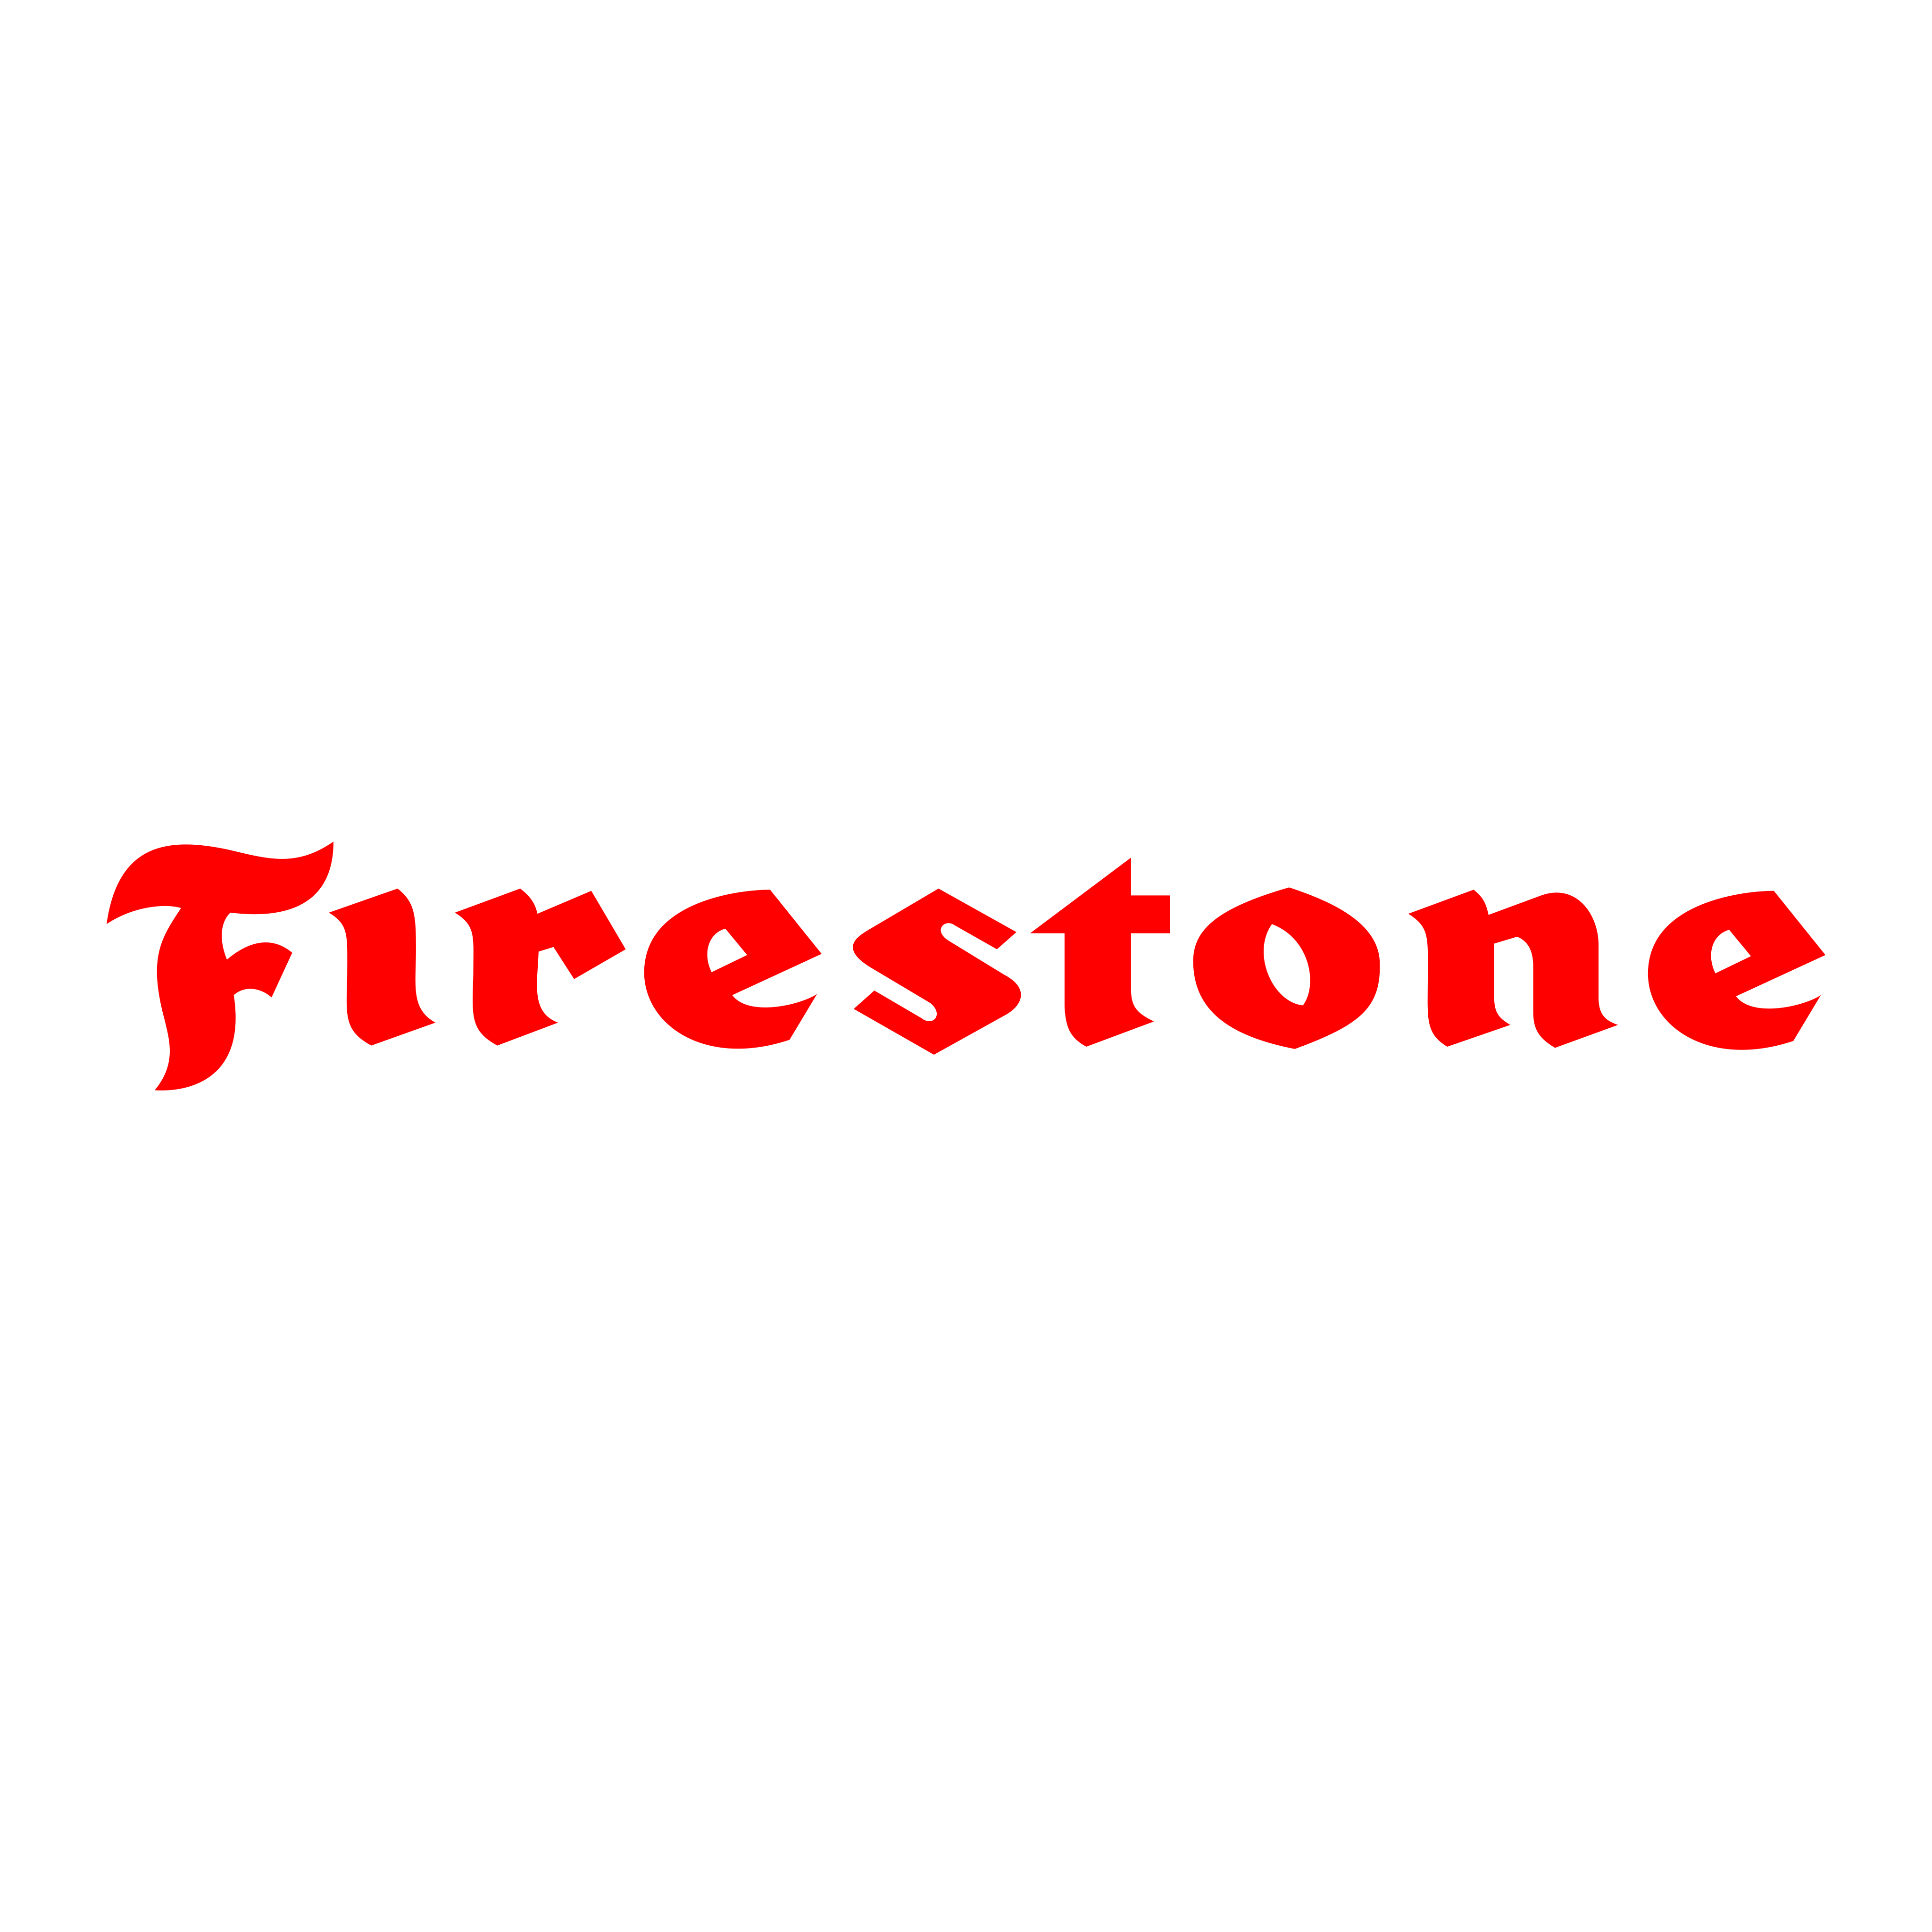 firestone logo.